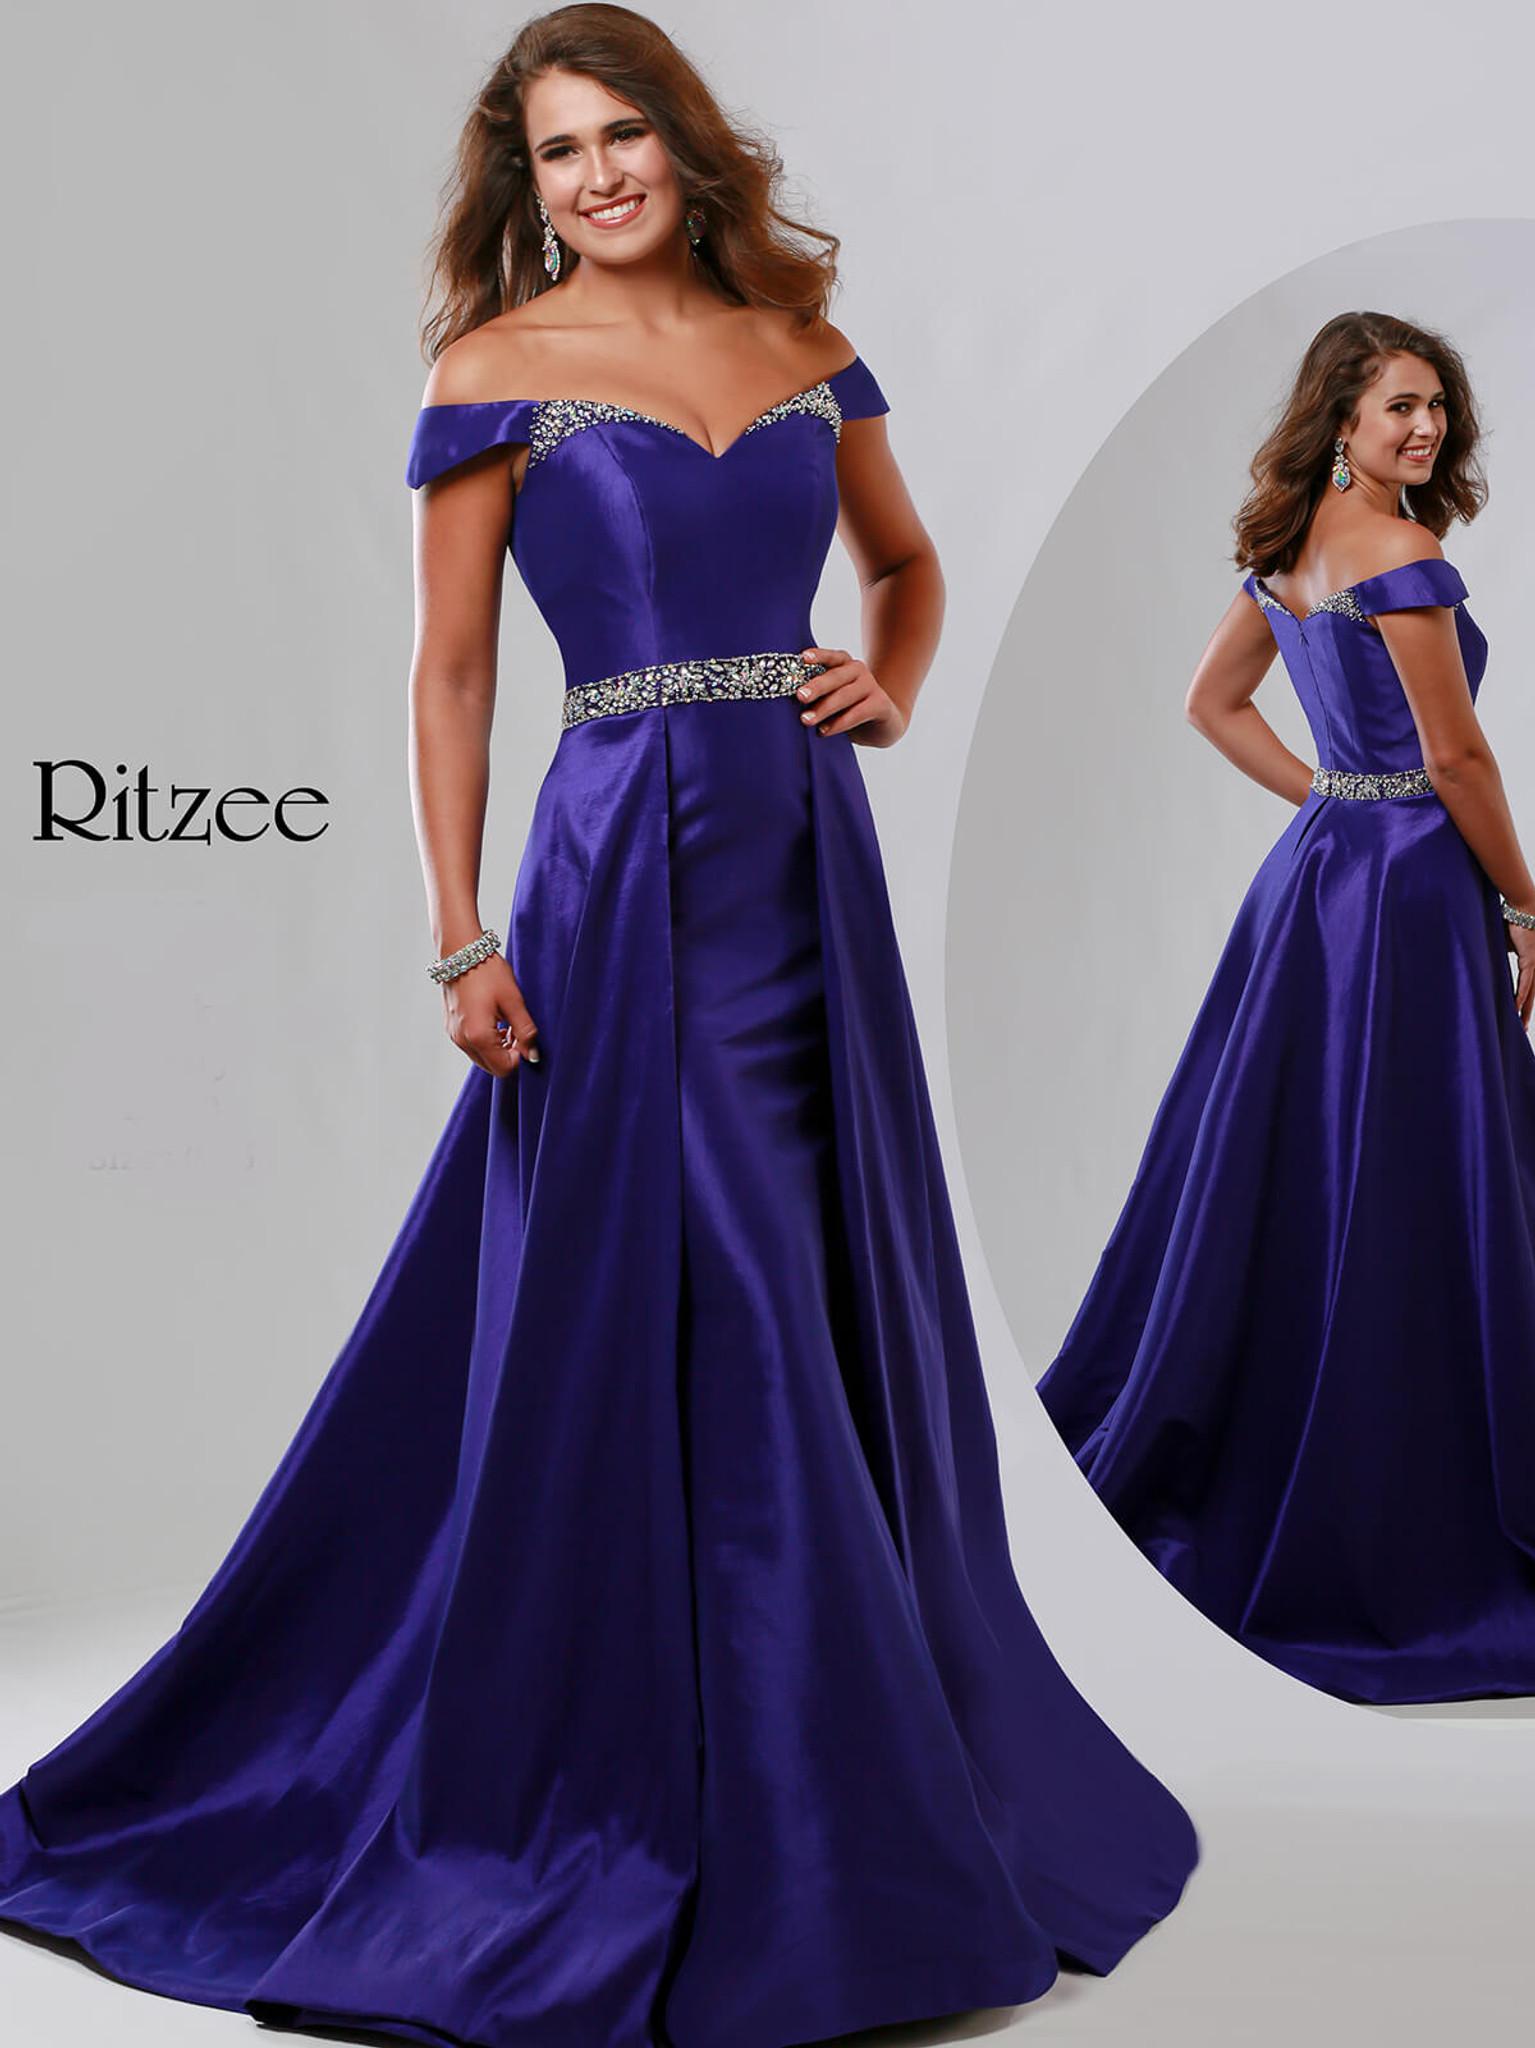 A-line Ritzee Originals 3519 Pageant Dress PageantDesigns